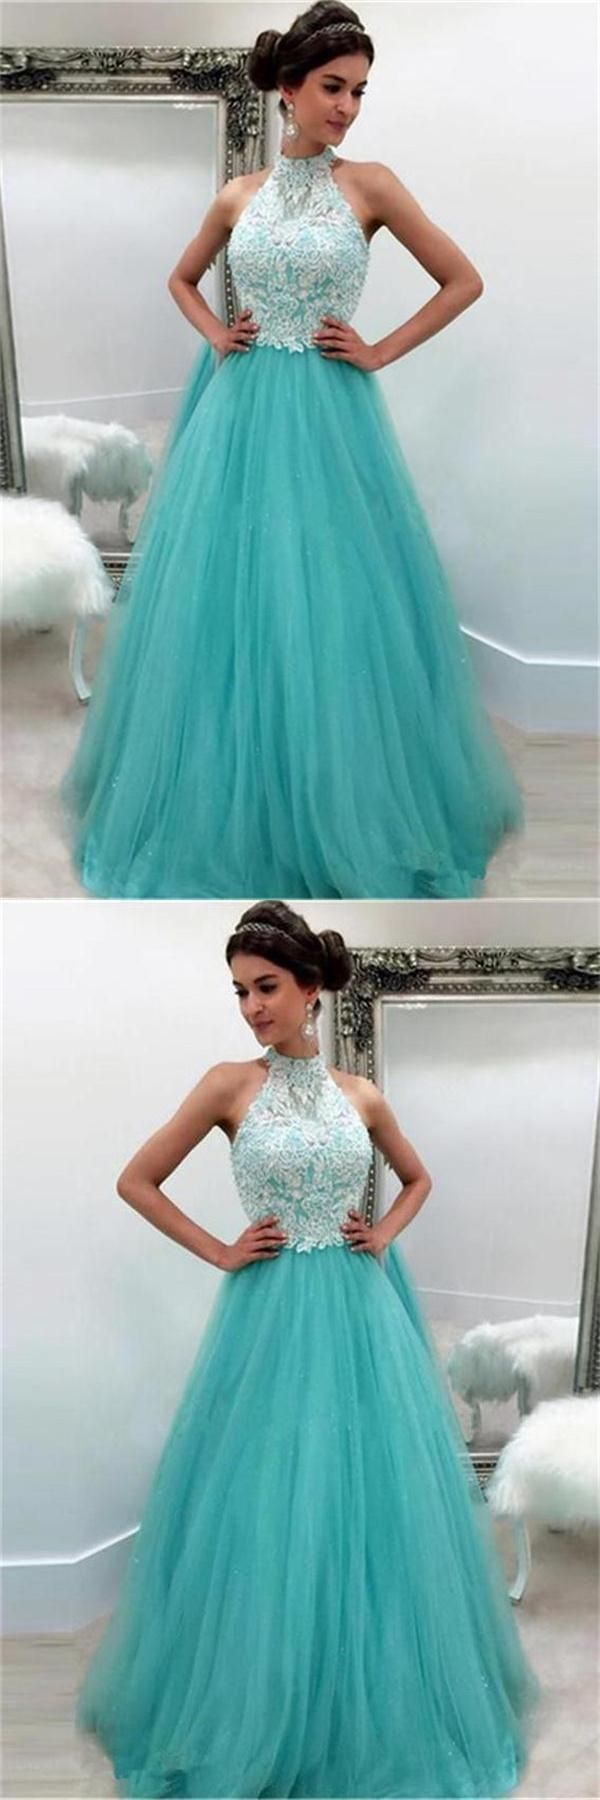 Hot sale fancy cheap prom dresses prom dresses aline lace prom